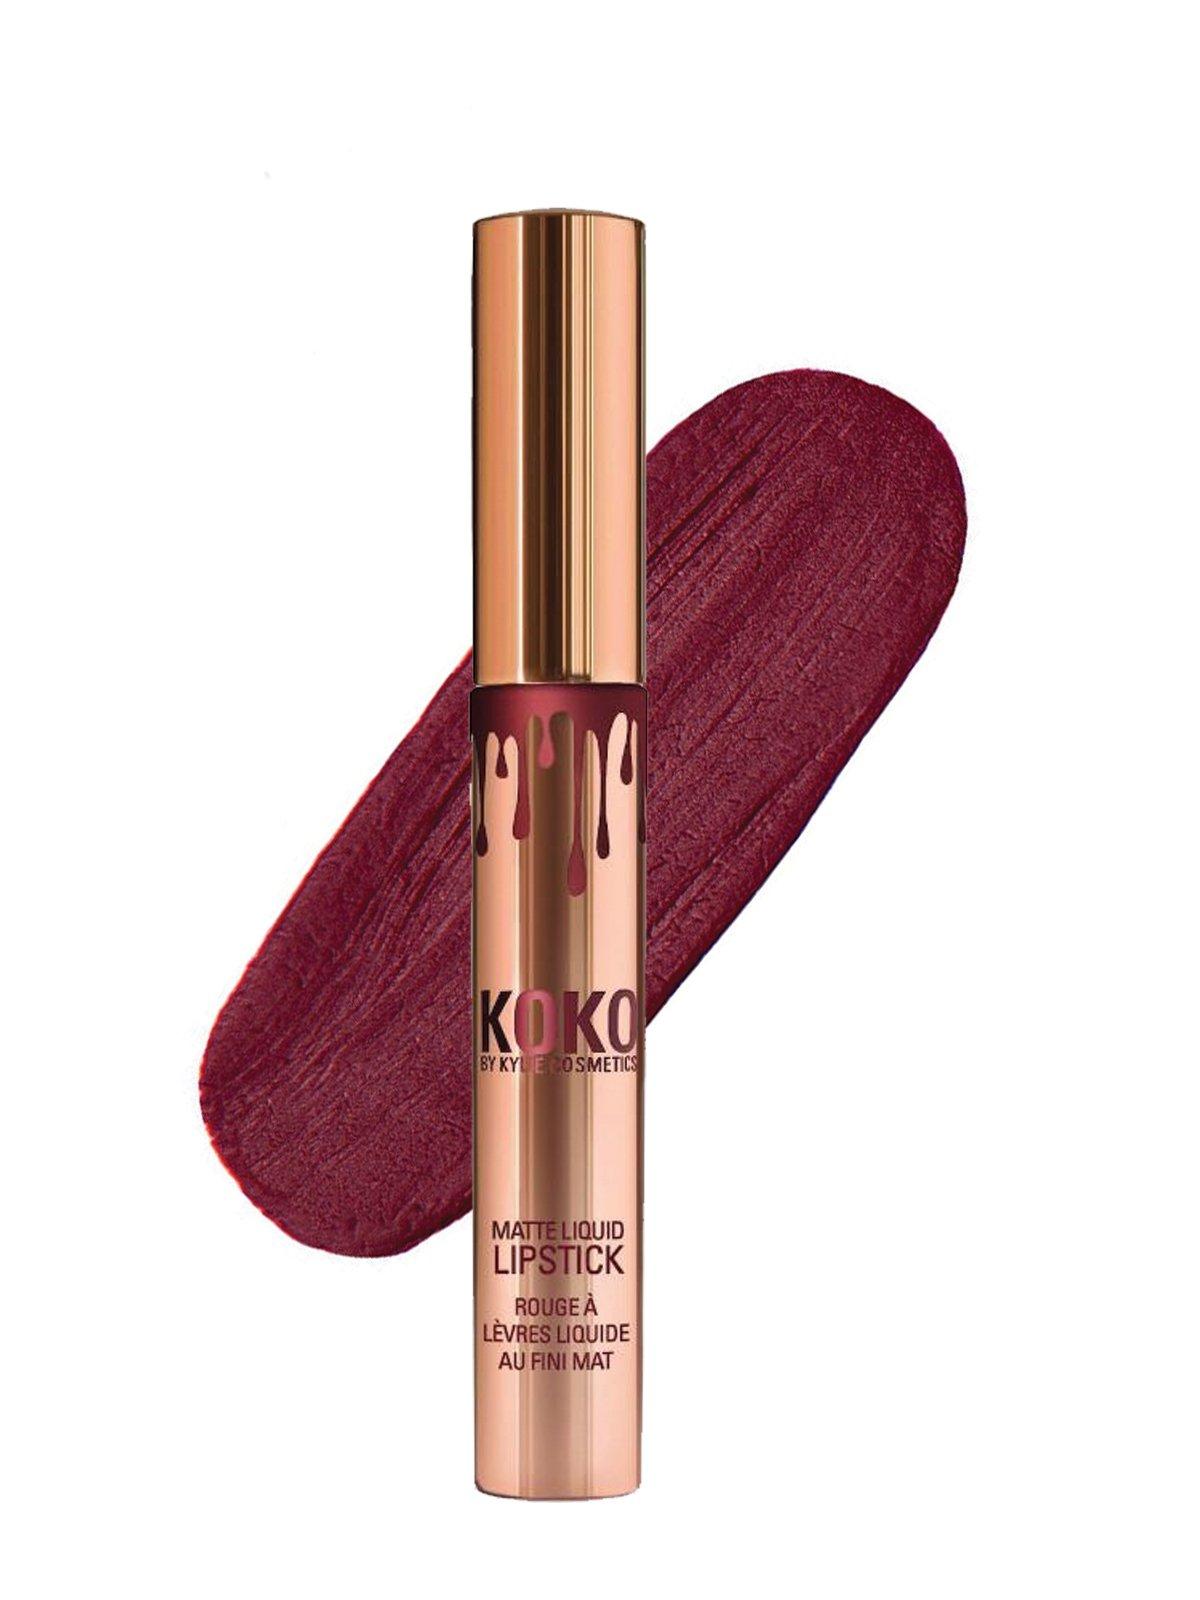 Kylie Cosmetics  - Matte Liquid Lipstick, Gorg